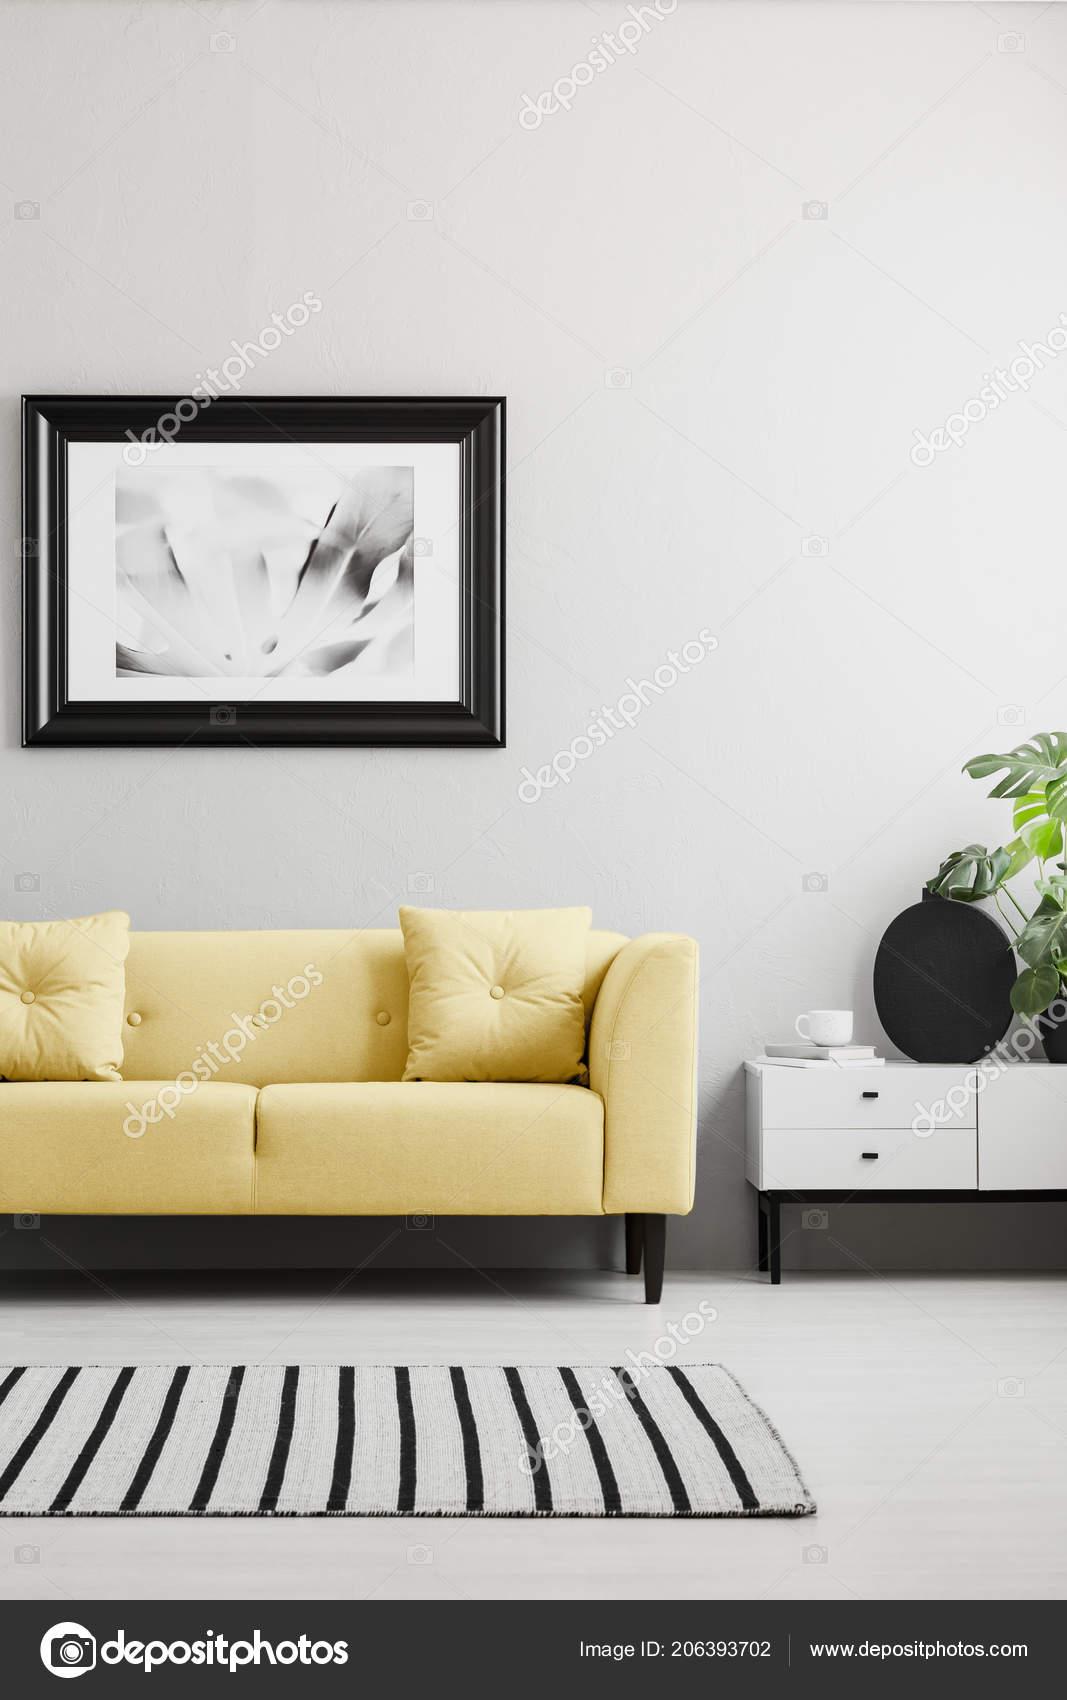 Poster Yellow Sofa Minimal Grey Living Room Interior Rug